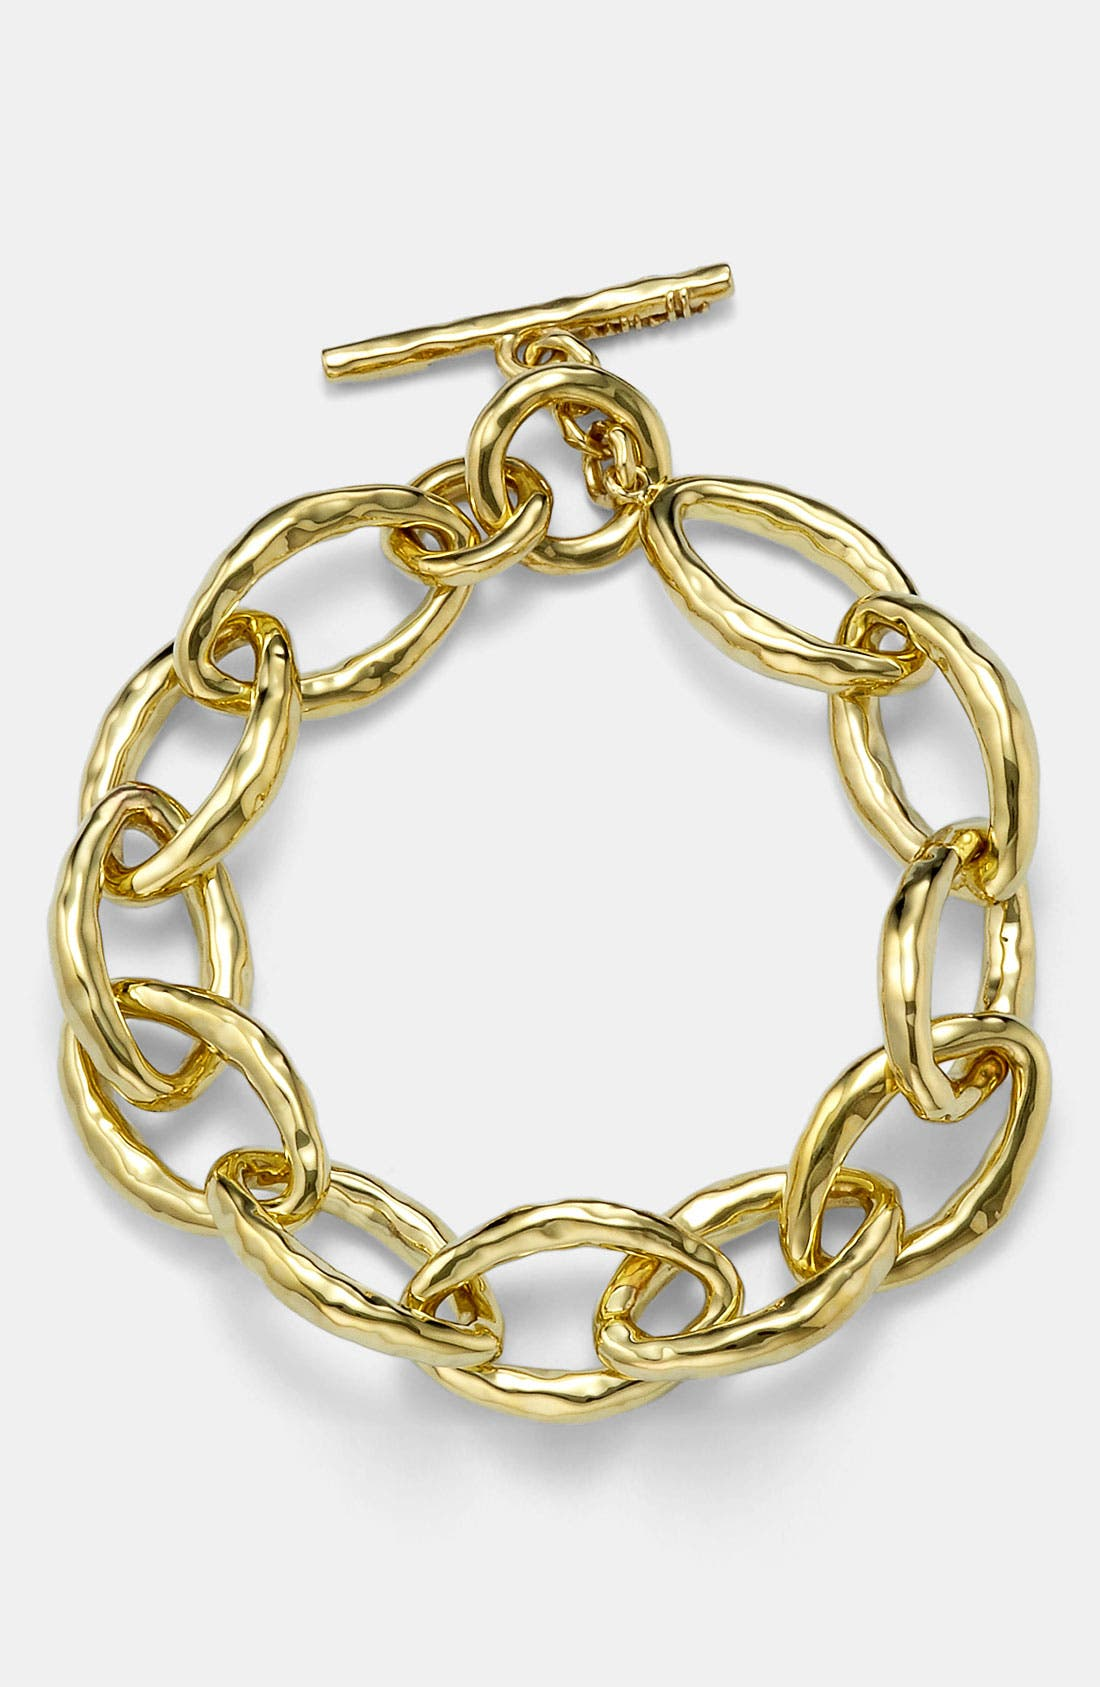 Main Image - Ippolita 'Glamazon' 18k Gold Link Bracelet